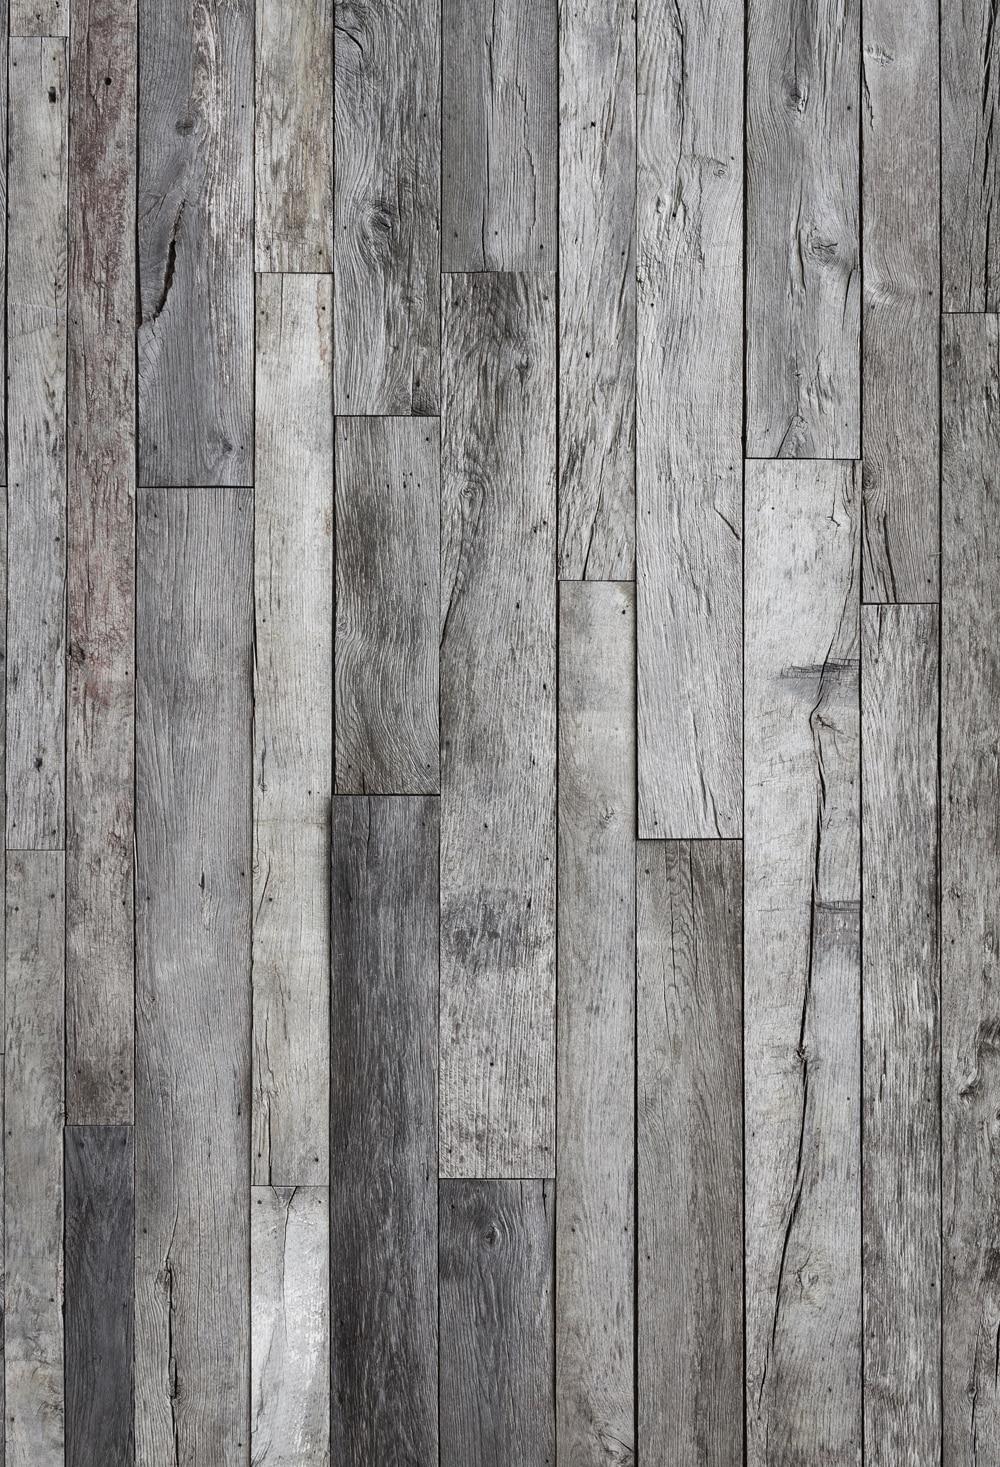 Gray Wood Backdrop Newborn Photo Background Photo Studio